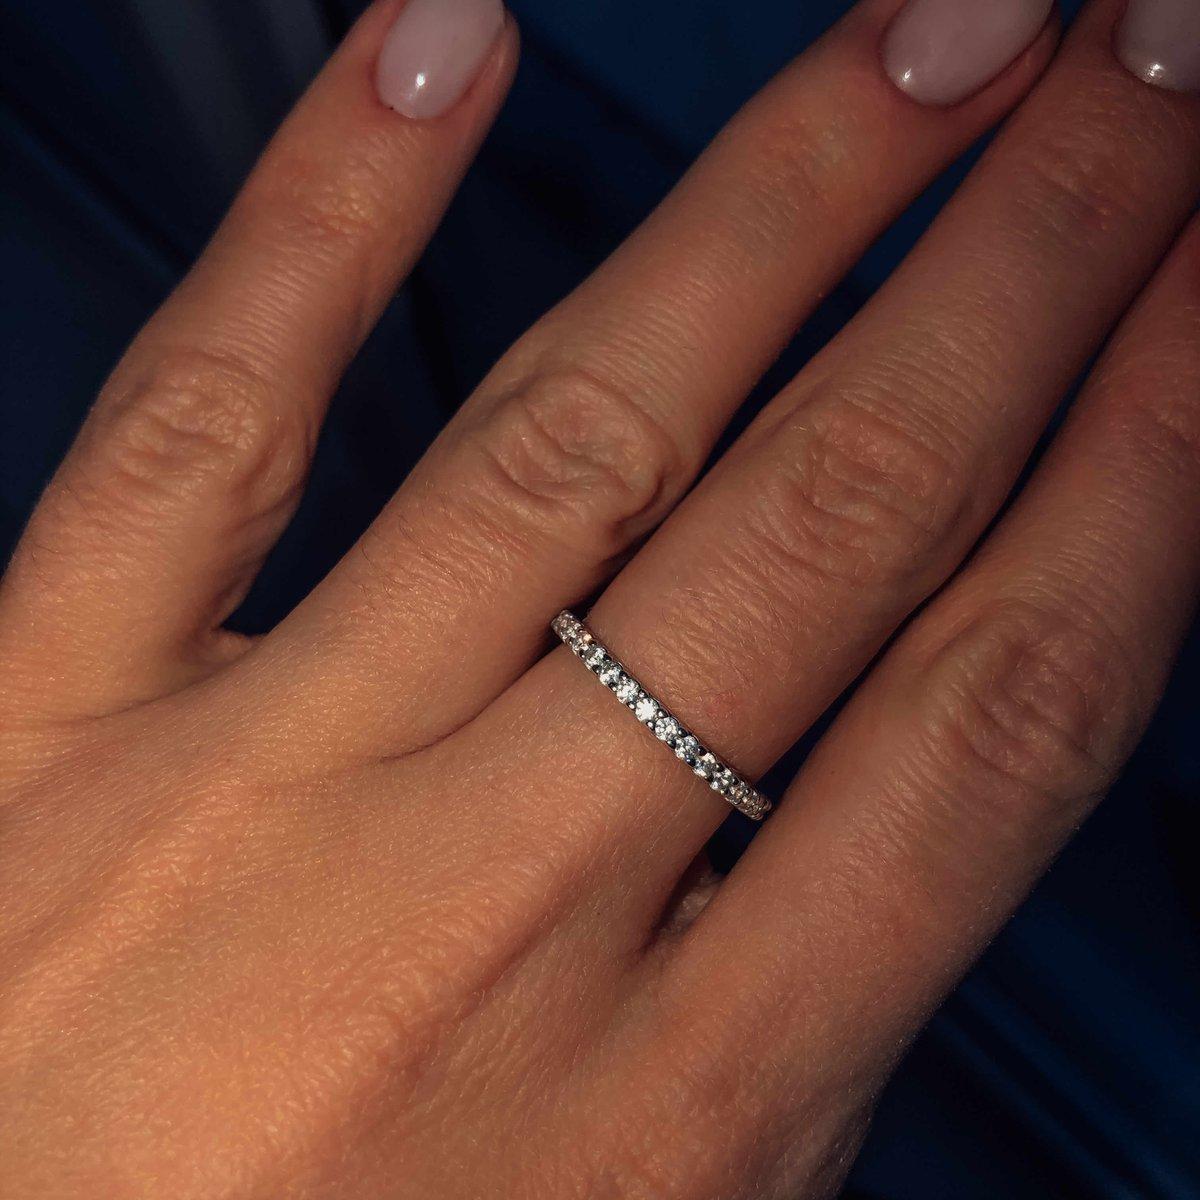 Самое нежное кольцо «господи спаси и сохрани»